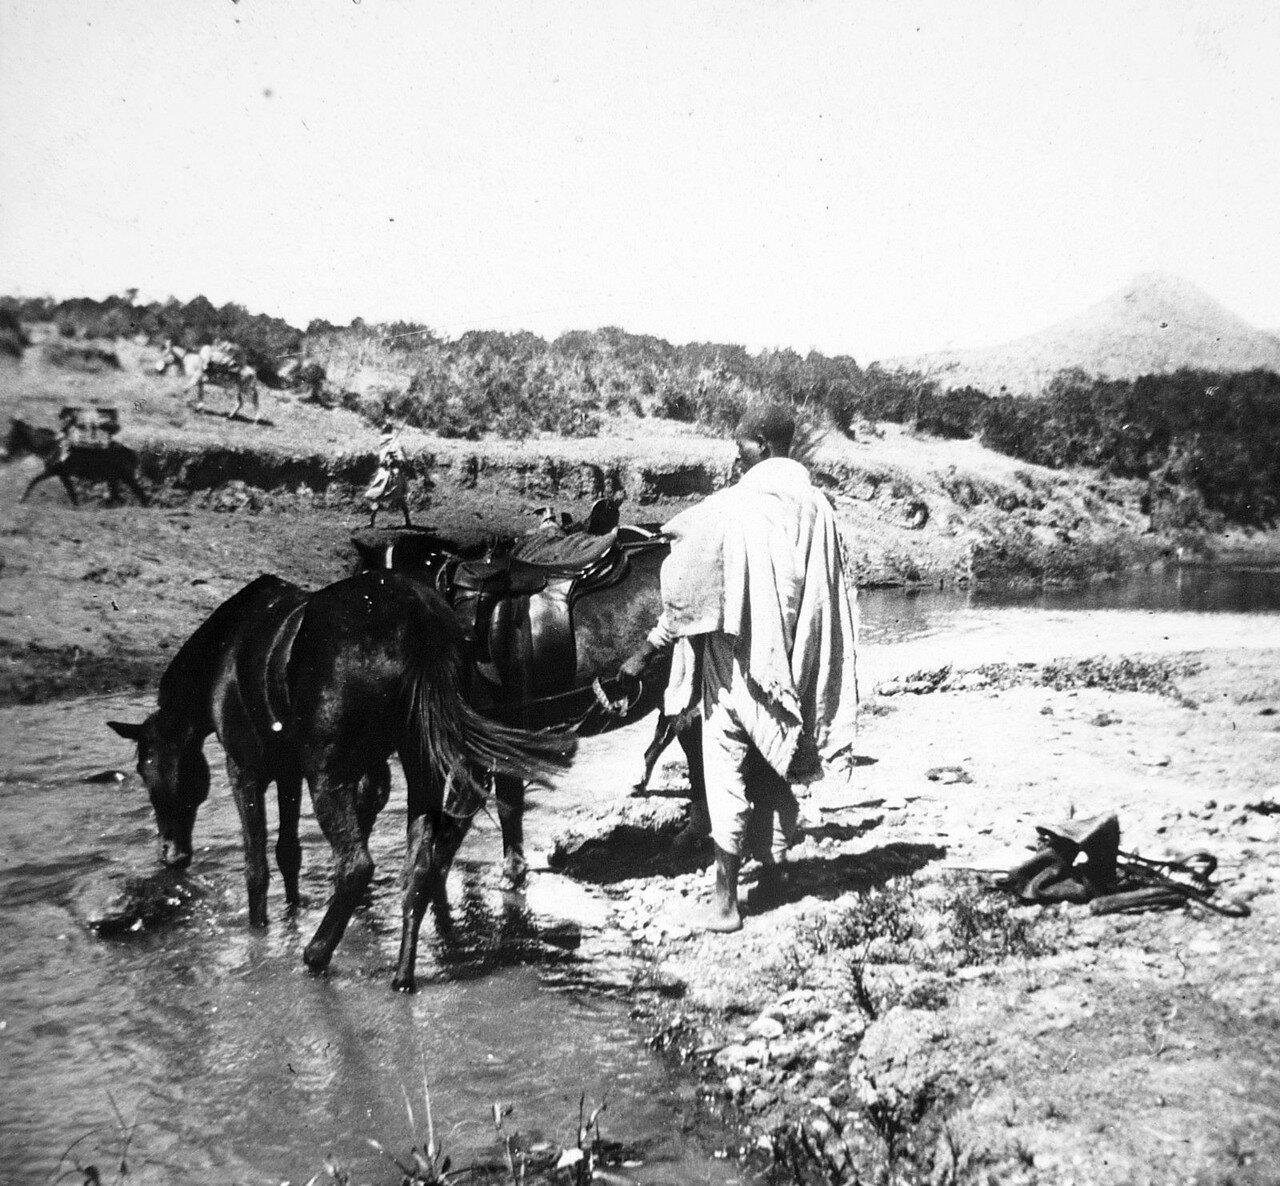 1897. Абиссиния. Водопой на дороге Джибутти - Аддис-Абеба